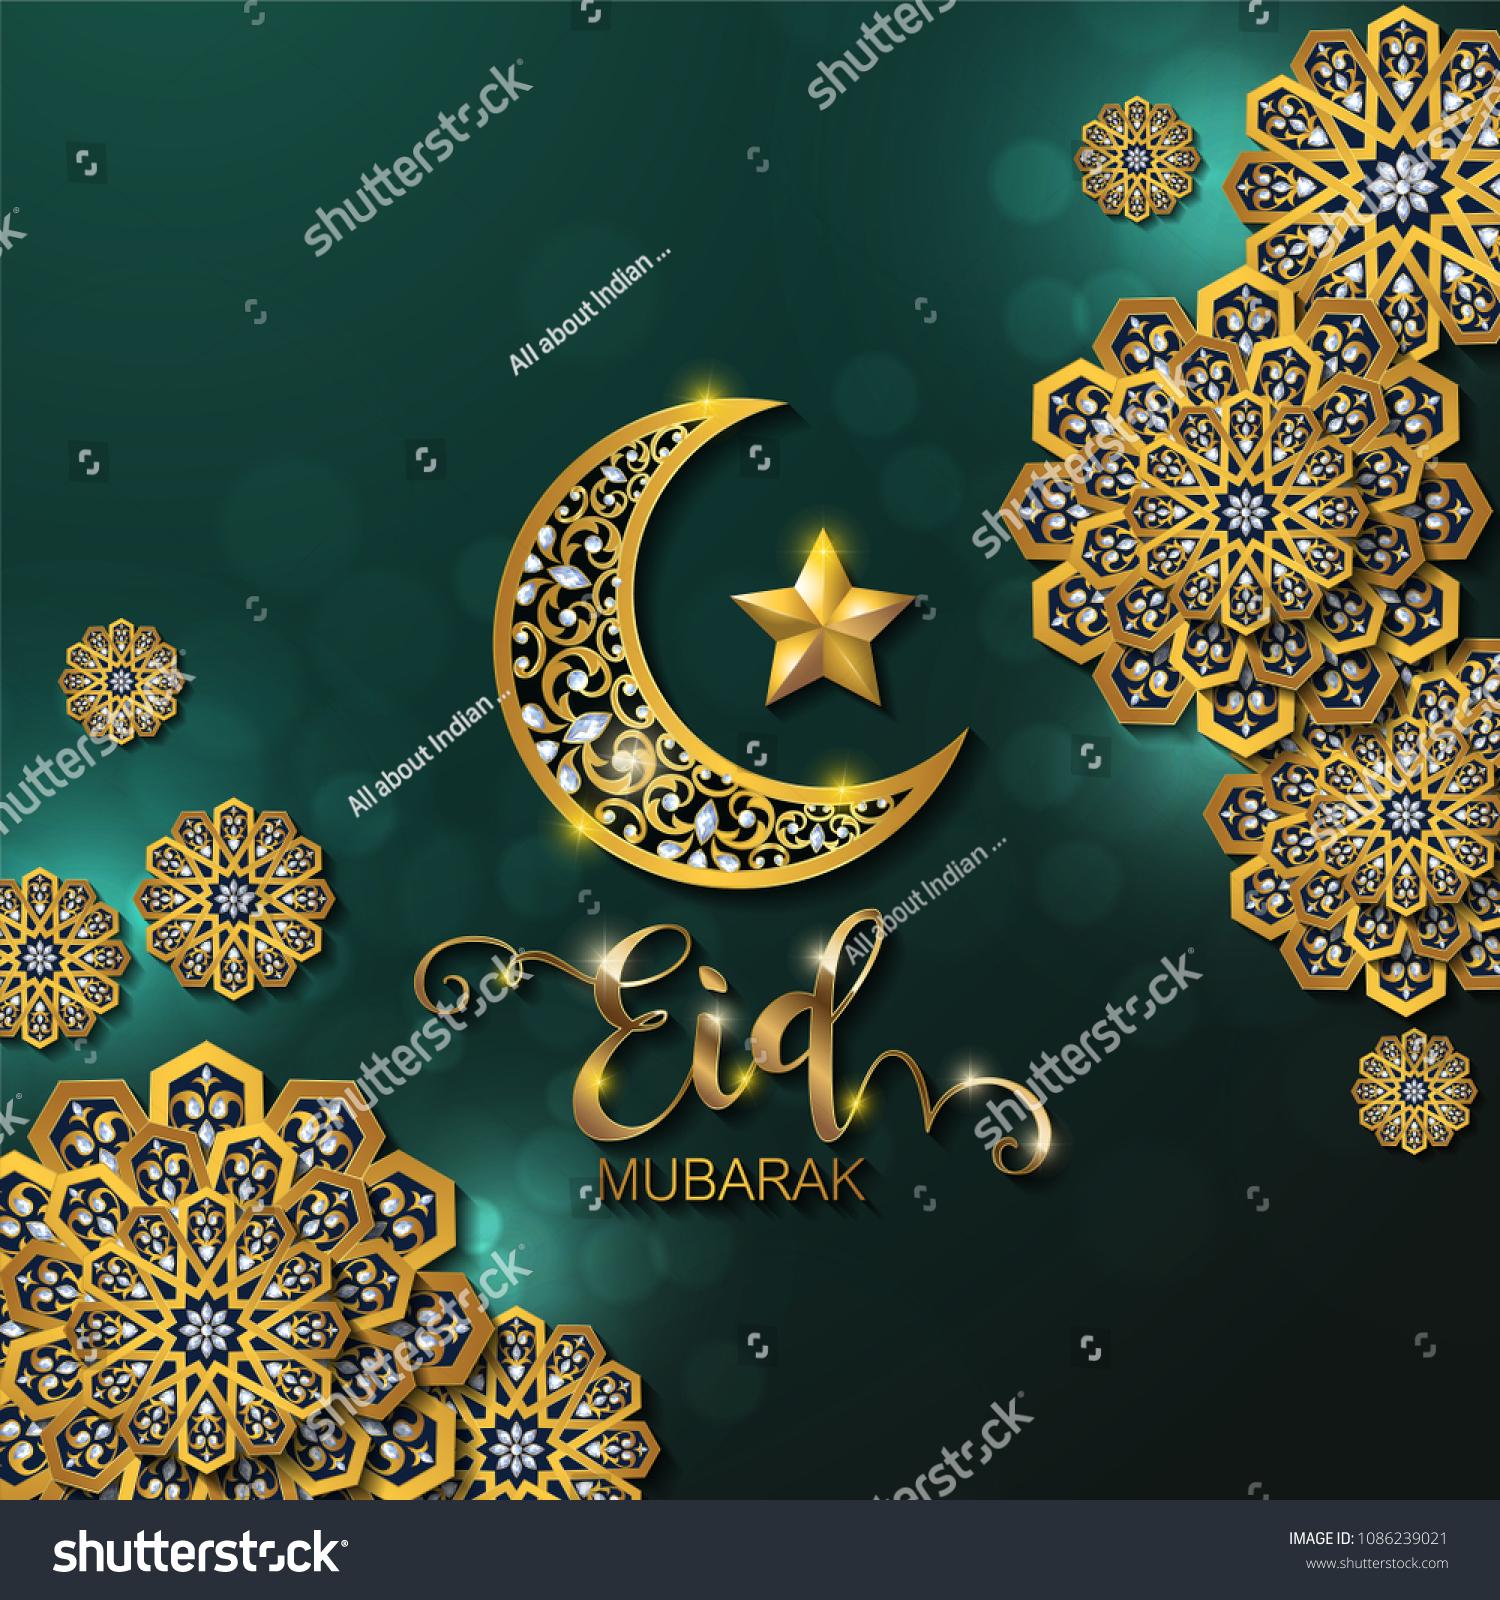 Eid Mubarak Greetings Background Islamic Gold Stock Vector Royalty Free 1086239021